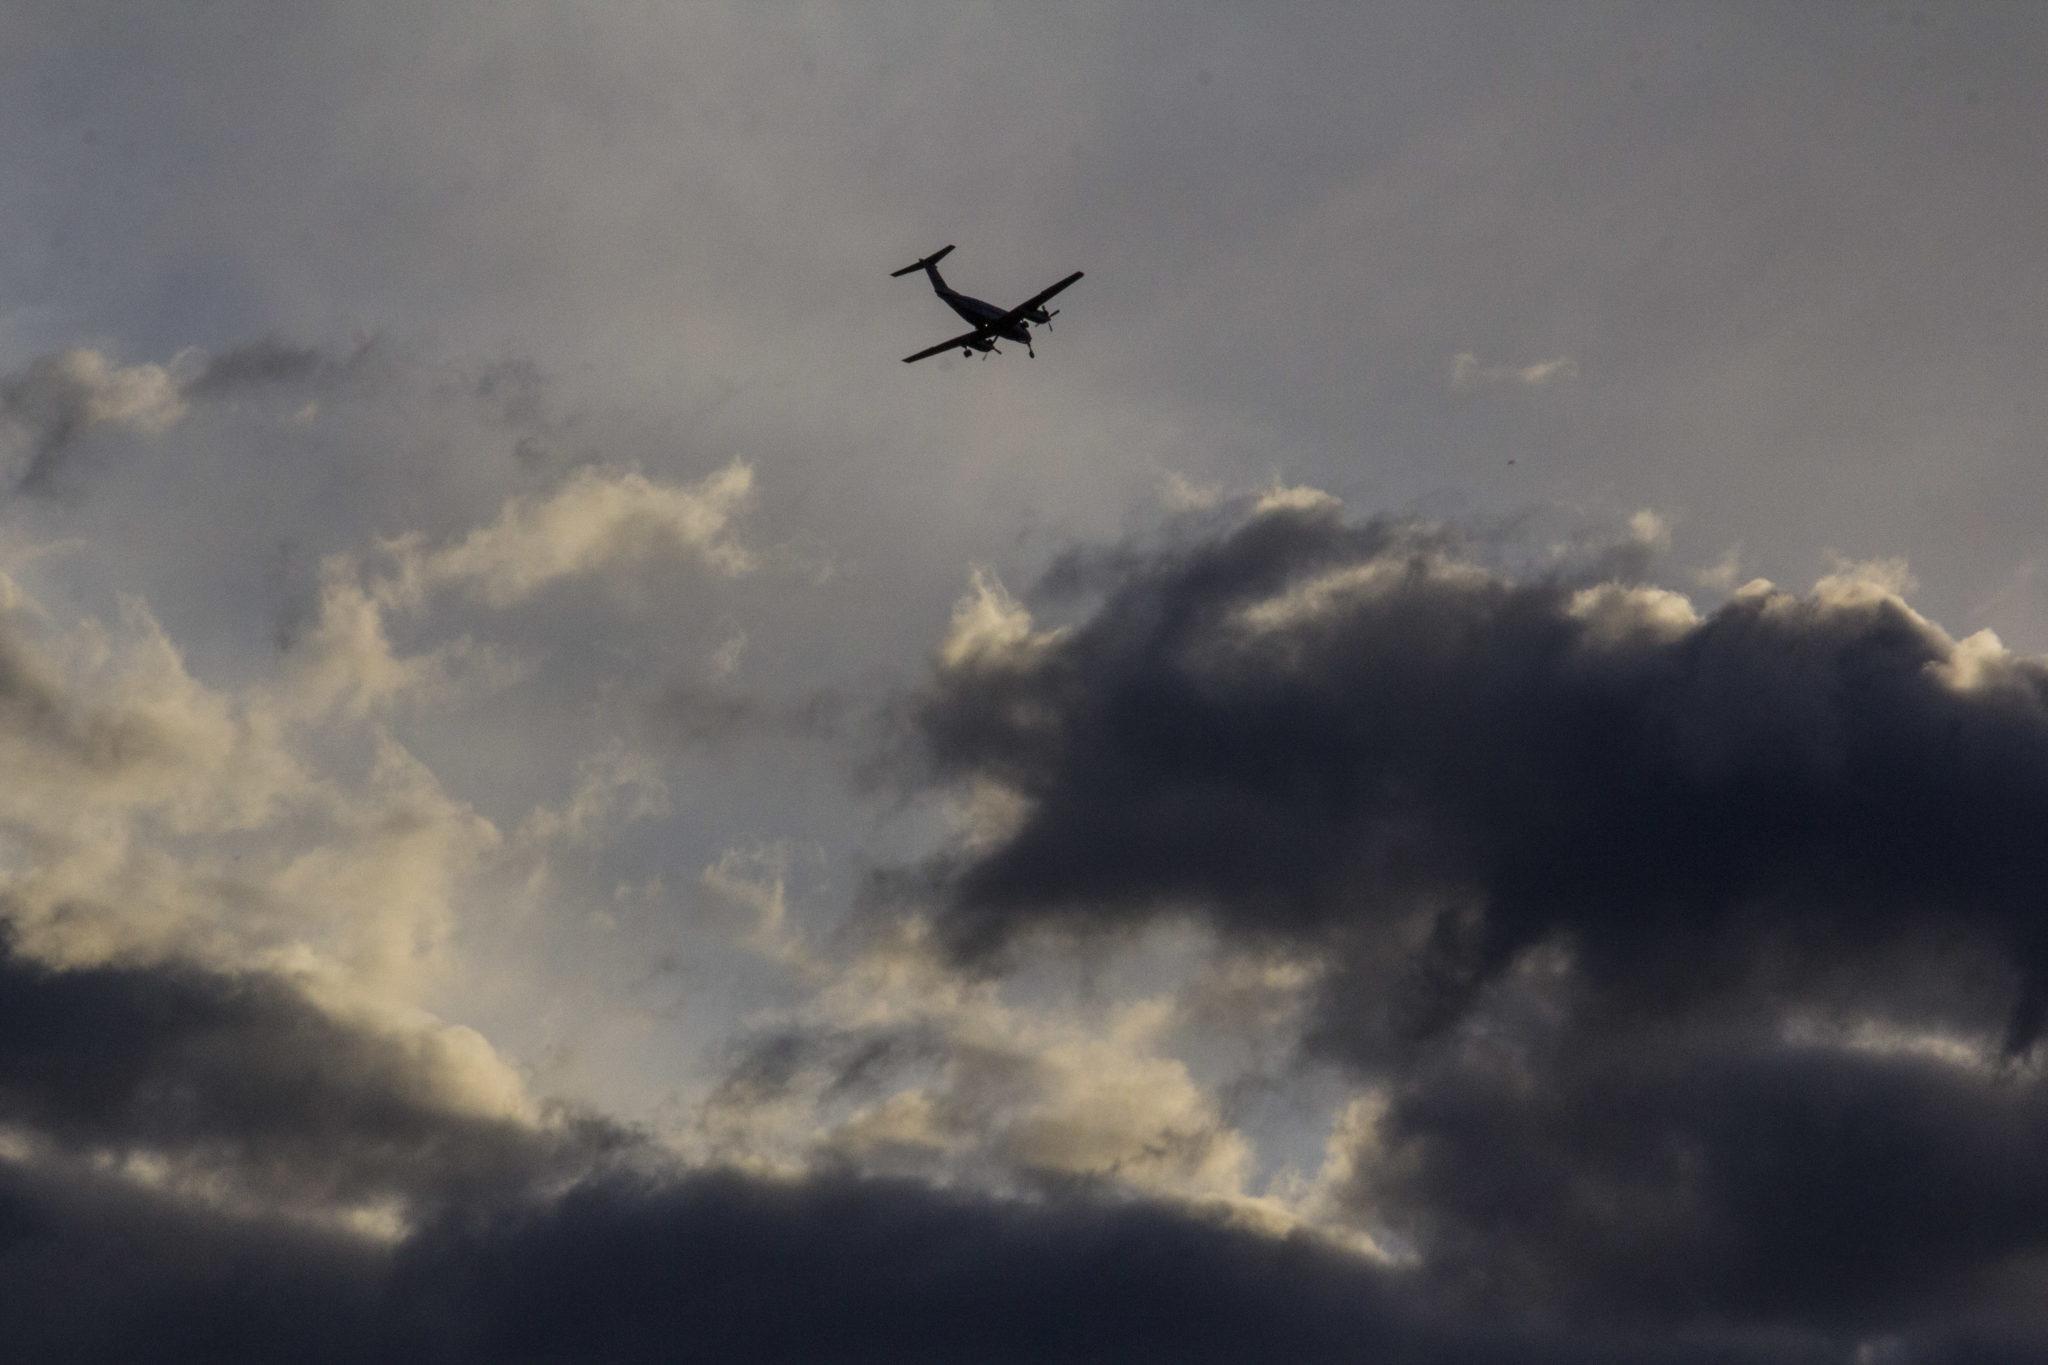 best airplane photographer, portrait photographers